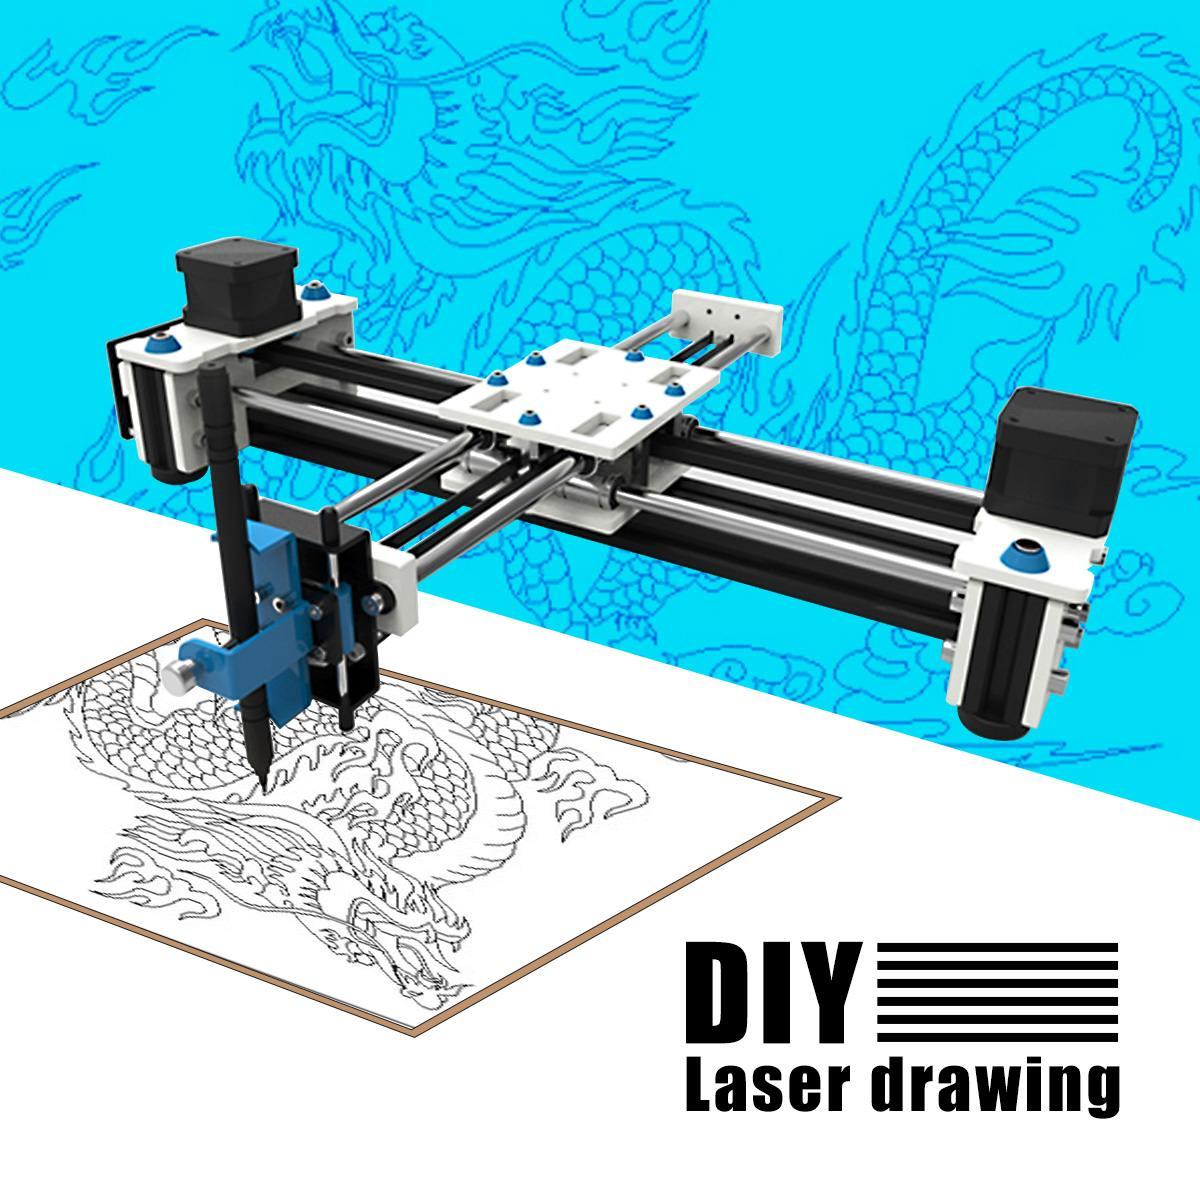 280x200mm mini xy 2 eixos cnc plotter caneta usb diy máquina de desenho a laser área gravura do desktop desenho robô